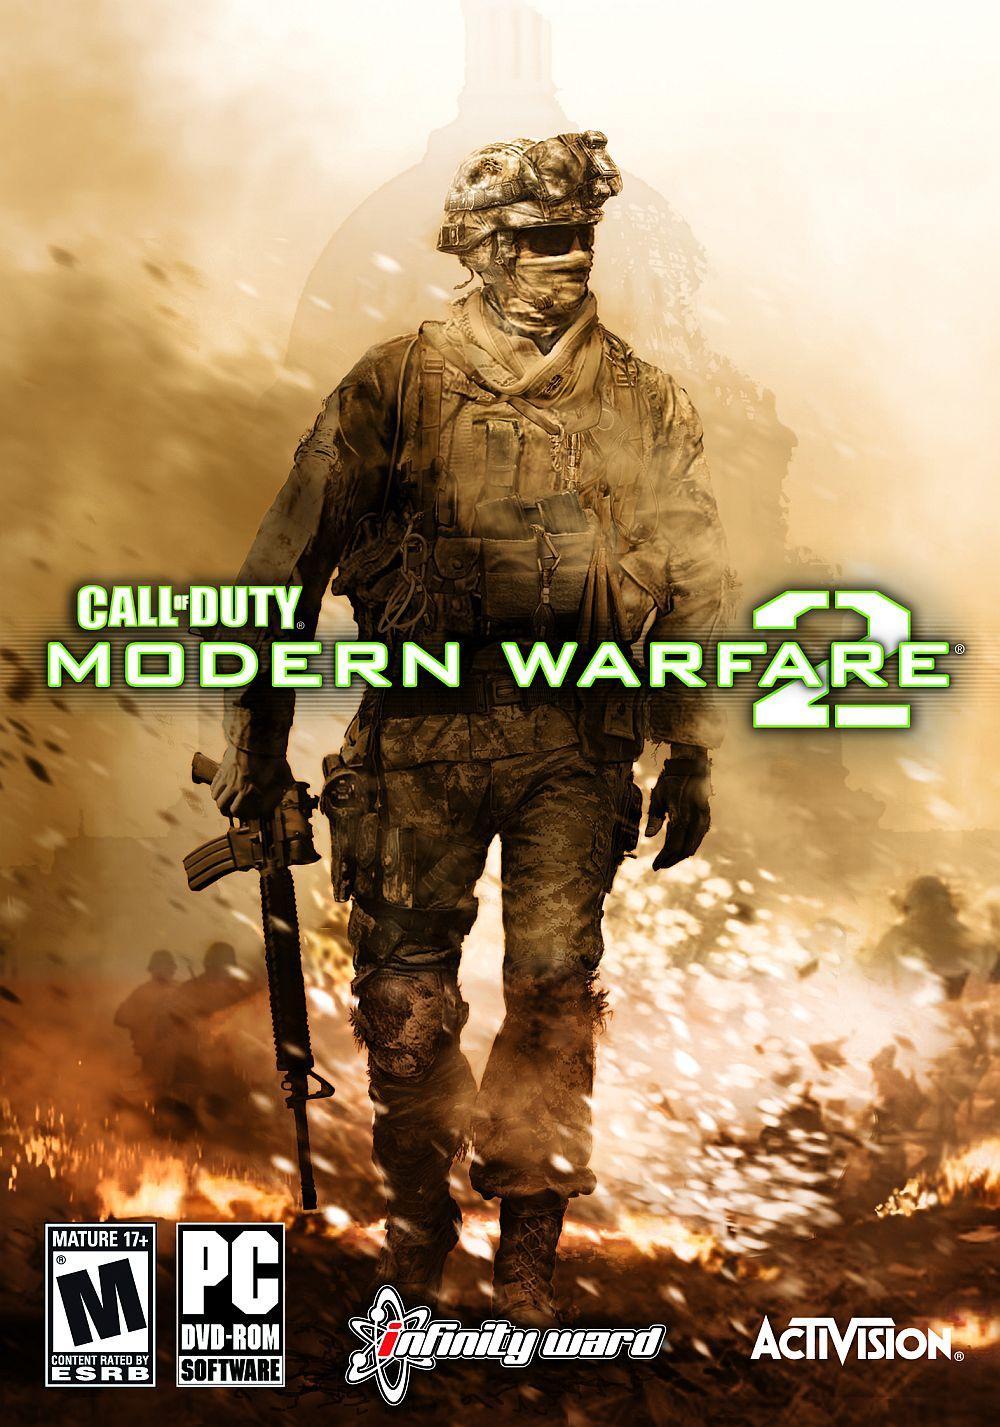 Descargar Call of Duty: Modern Warfare 2 español por mega